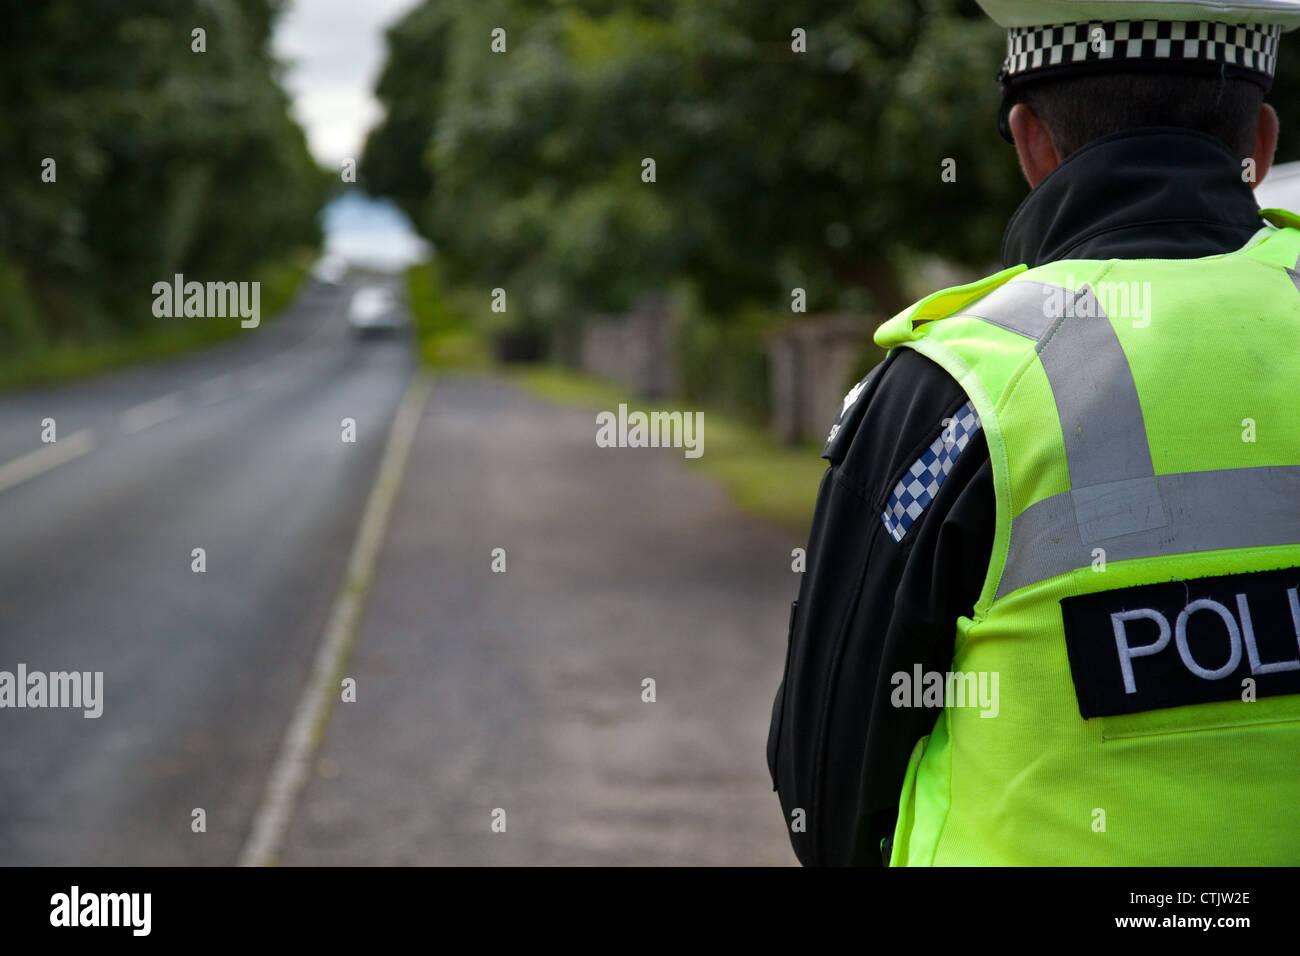 Traffic policeman on speed patrol check duties;  Police Traffic Officer, policing radar gun in North Yorkshire Dales Stock Photo